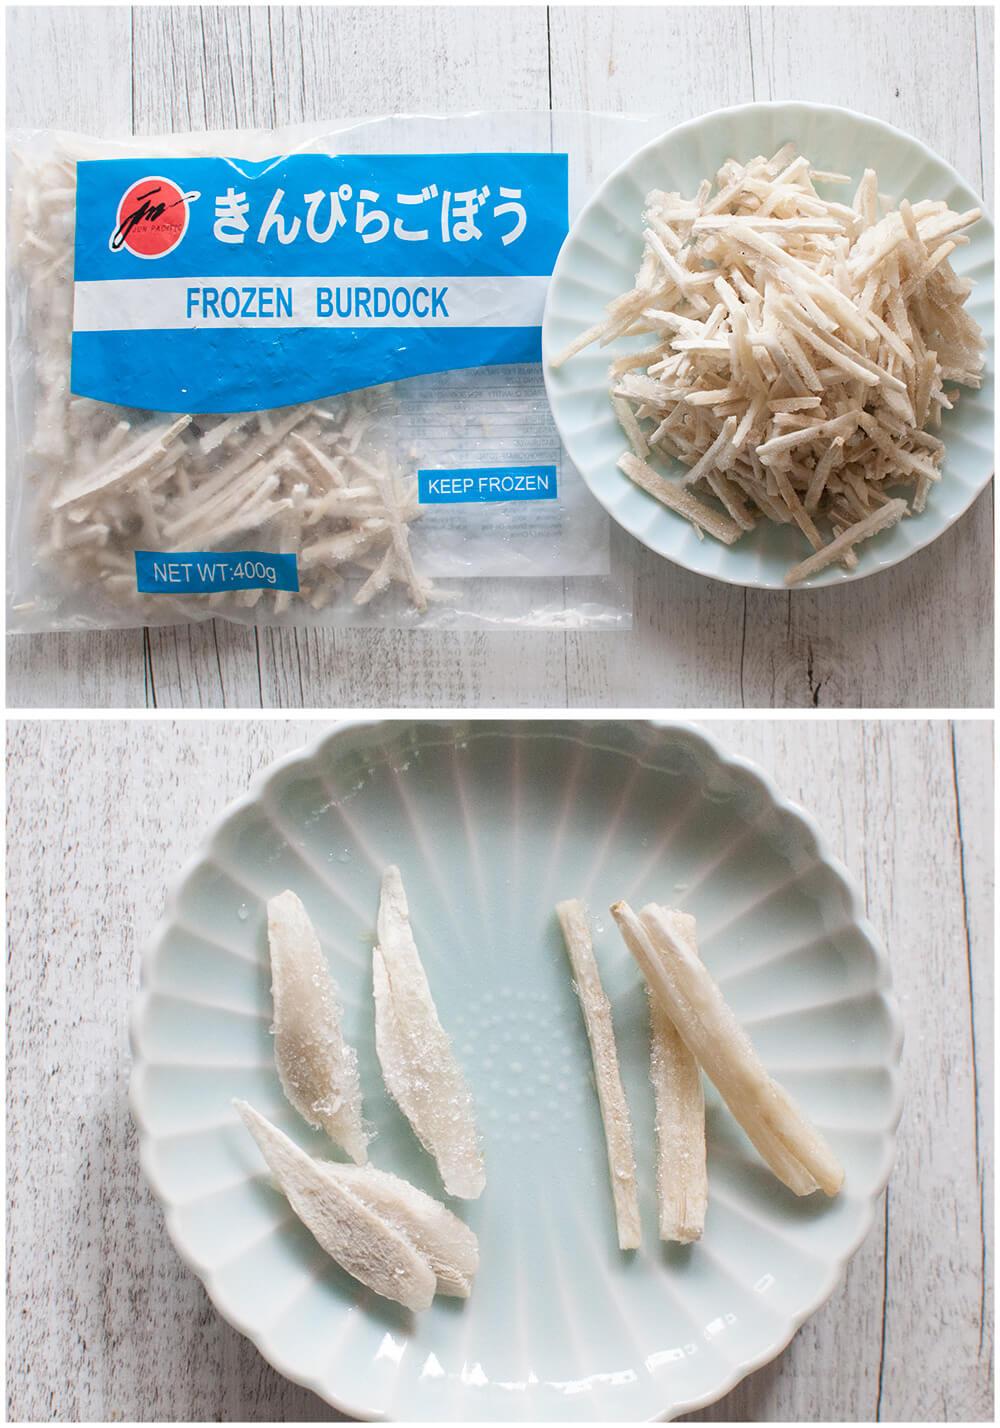 Frozen burdock cut into two different ways.